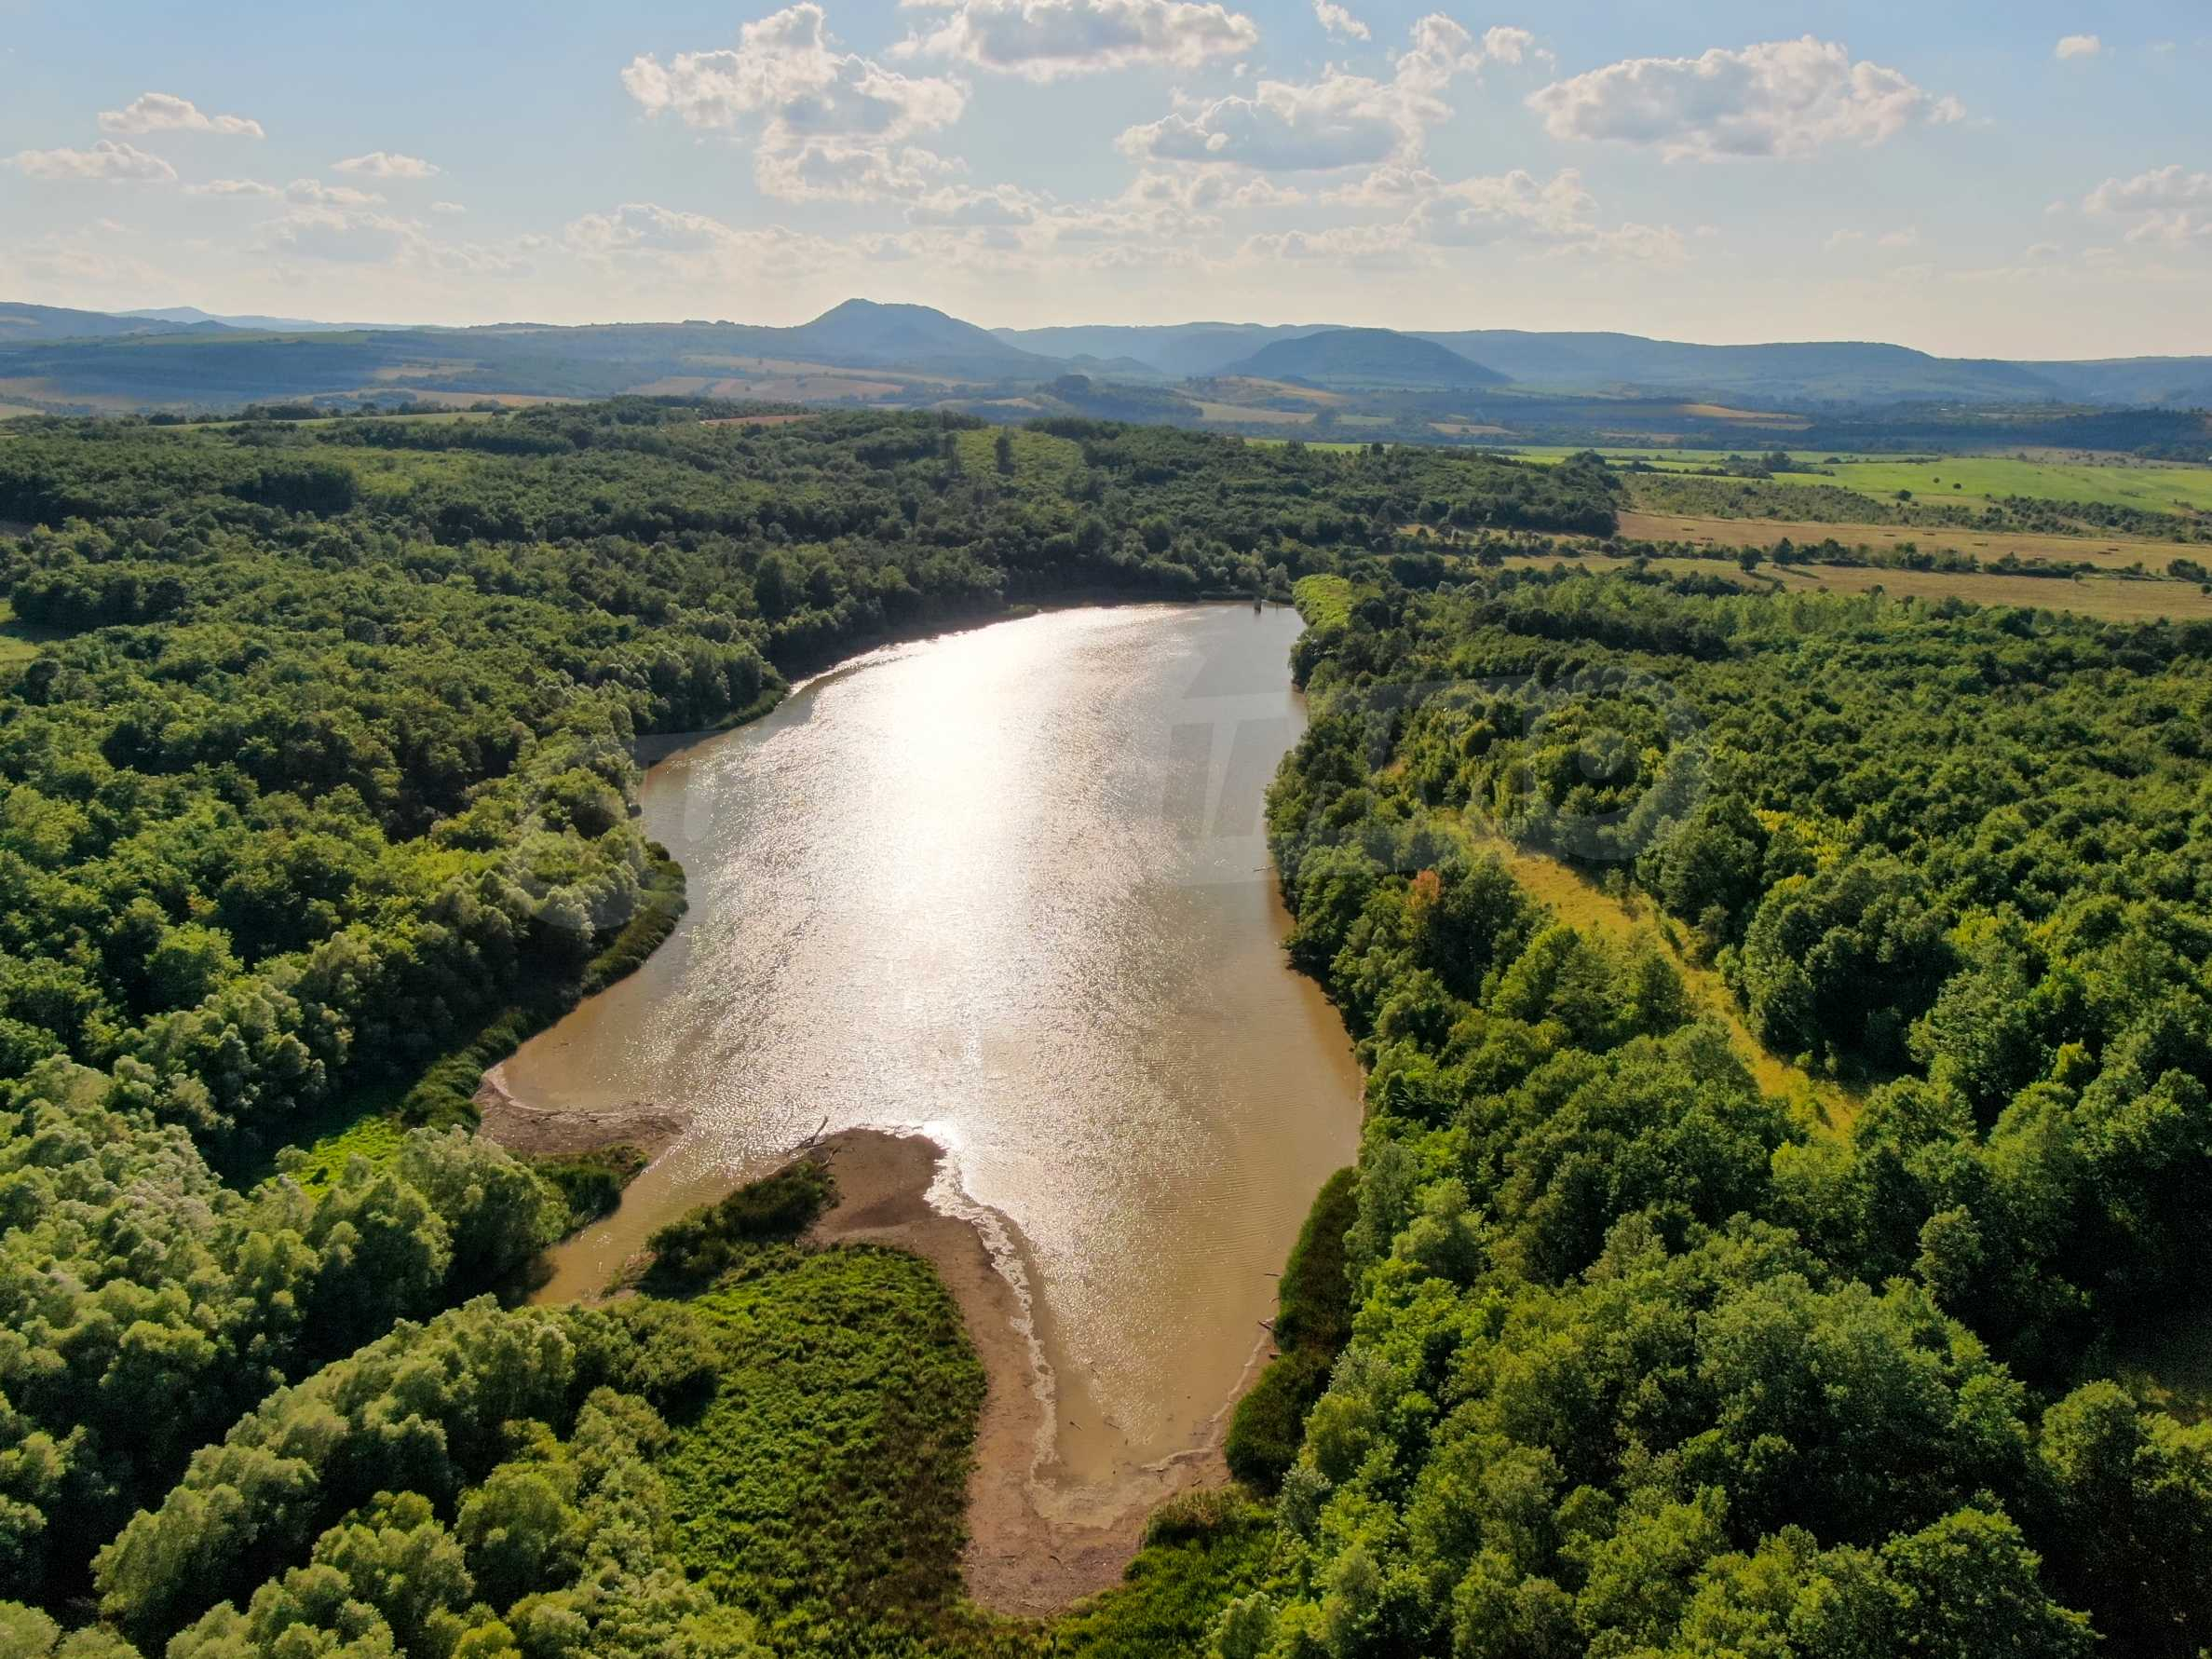 Private dam with land near Veliko Tarnovo